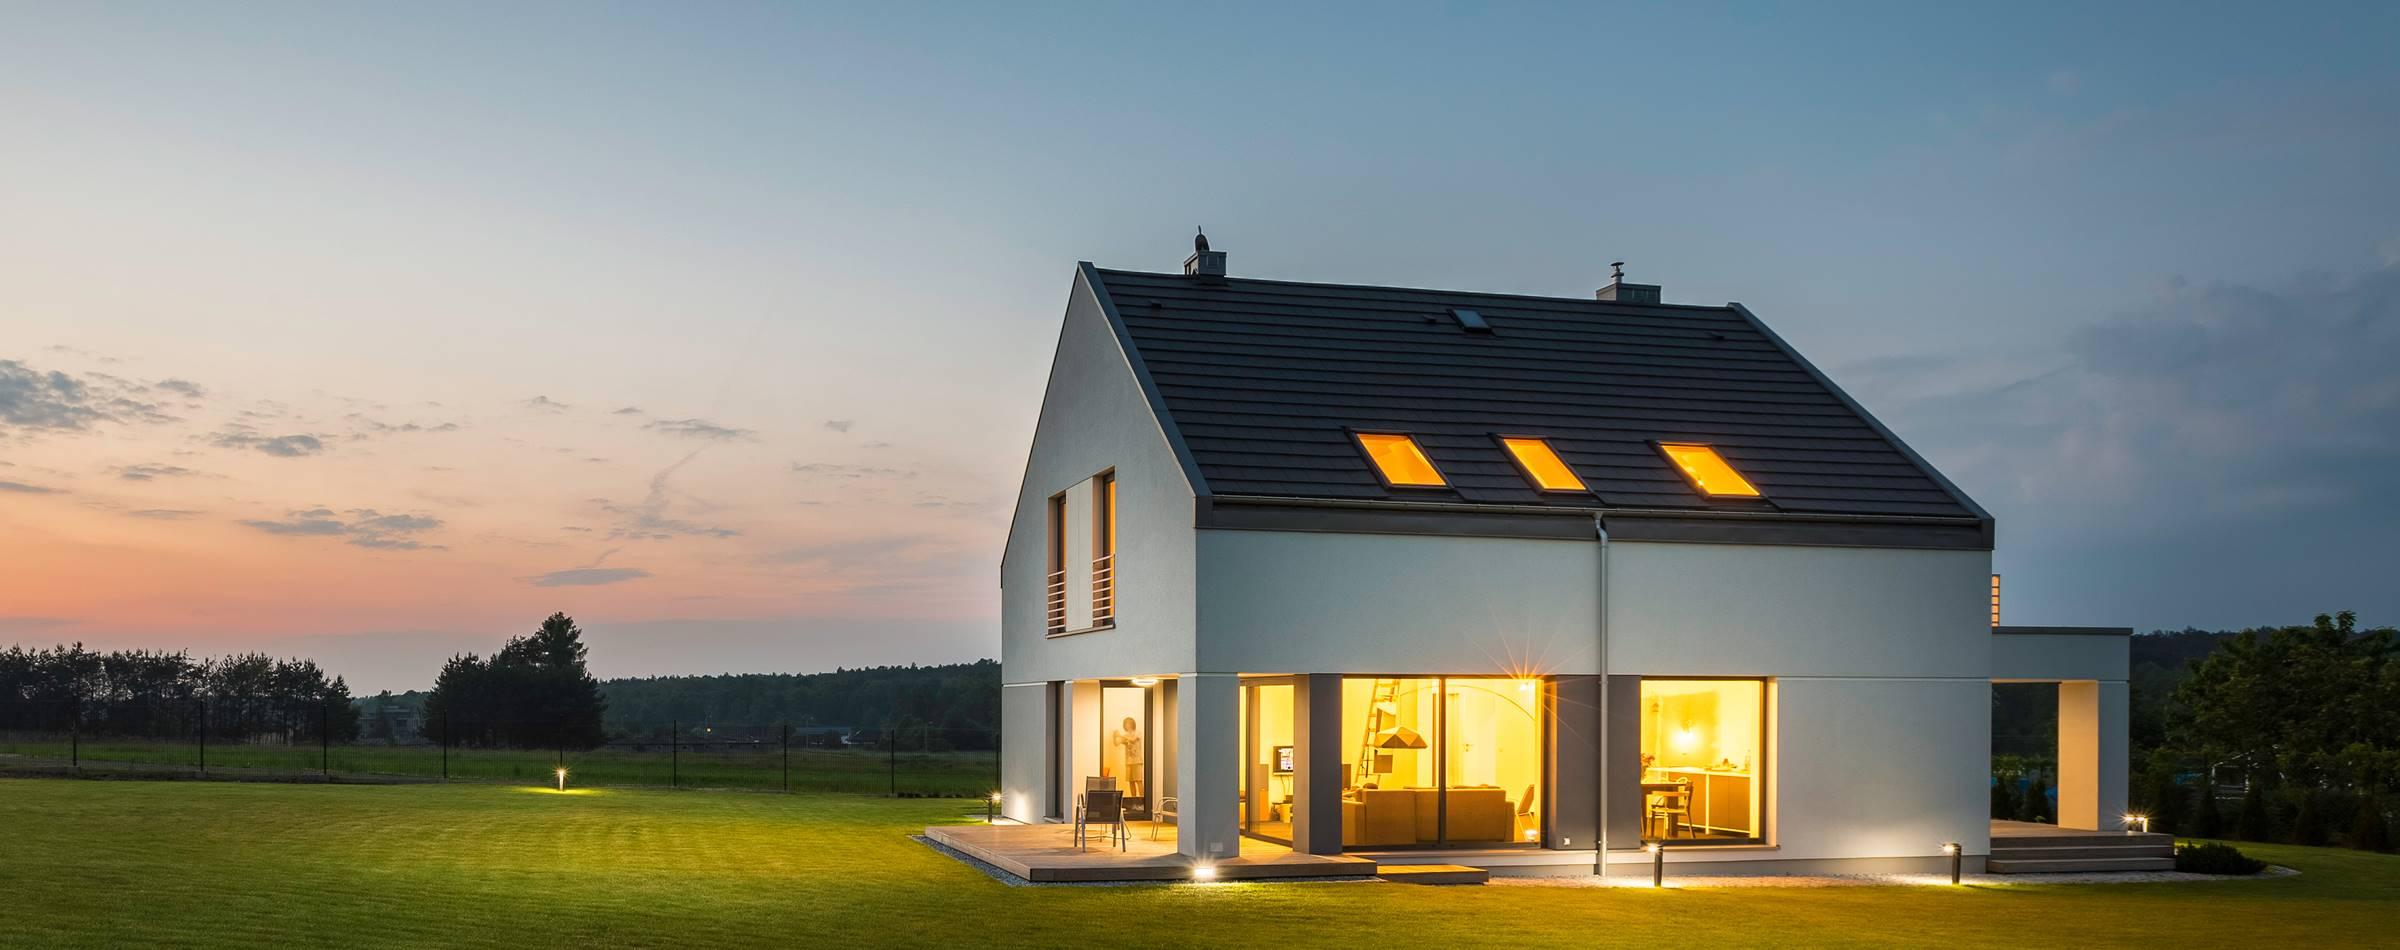 kogler dach gmbh holzriegelbau sch rding o. Black Bedroom Furniture Sets. Home Design Ideas